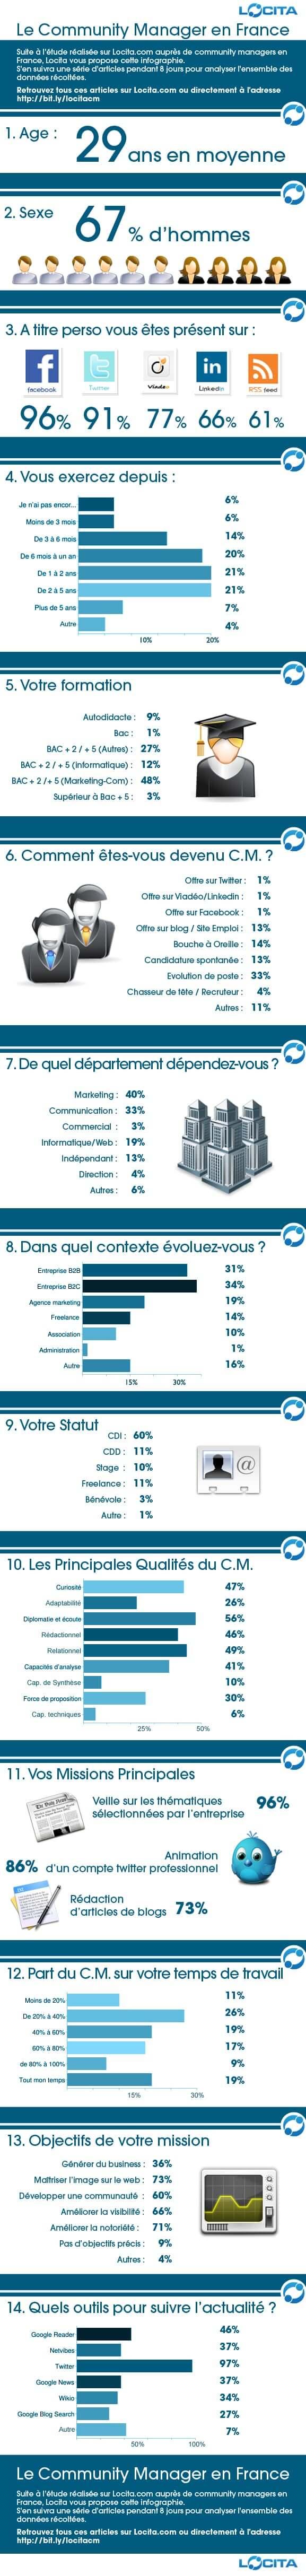 InfographieLocita